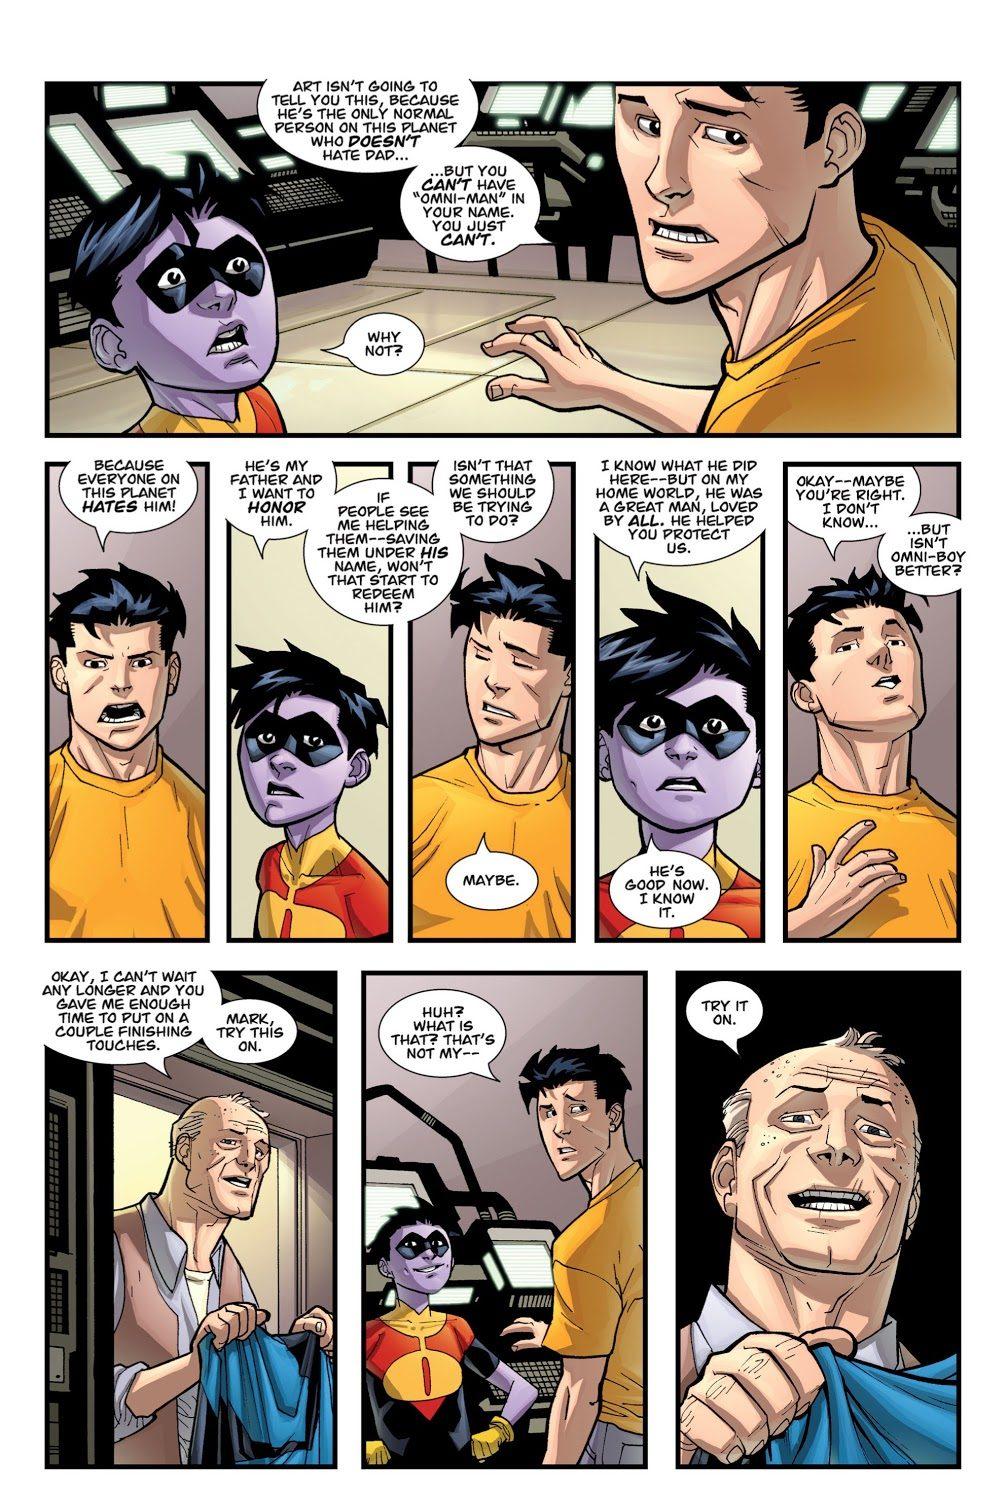 Oliver Grayson Chooses His Super Hero Name